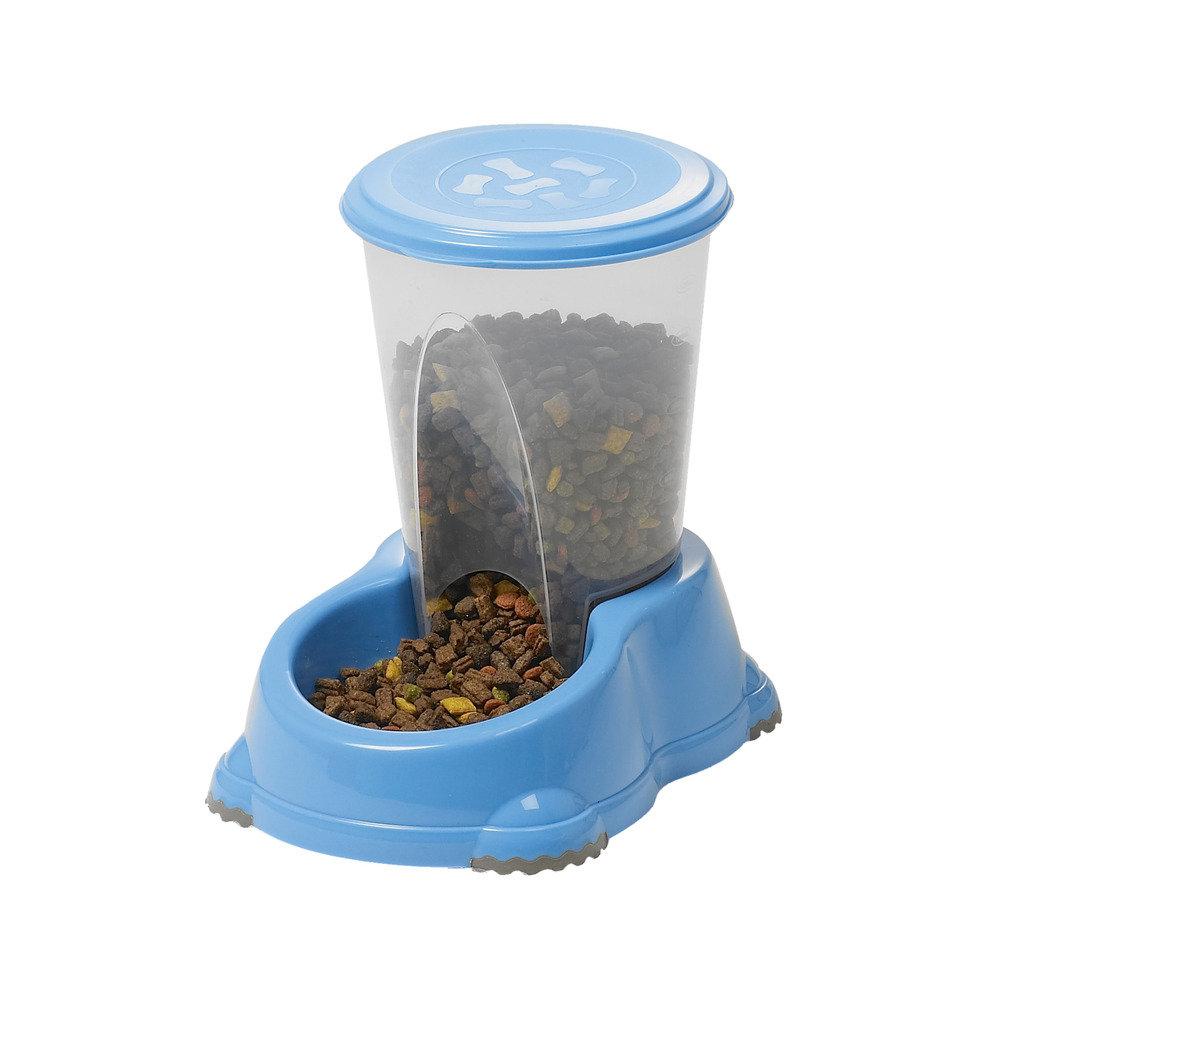 H141   座地糧食器  1.5L - 藍色